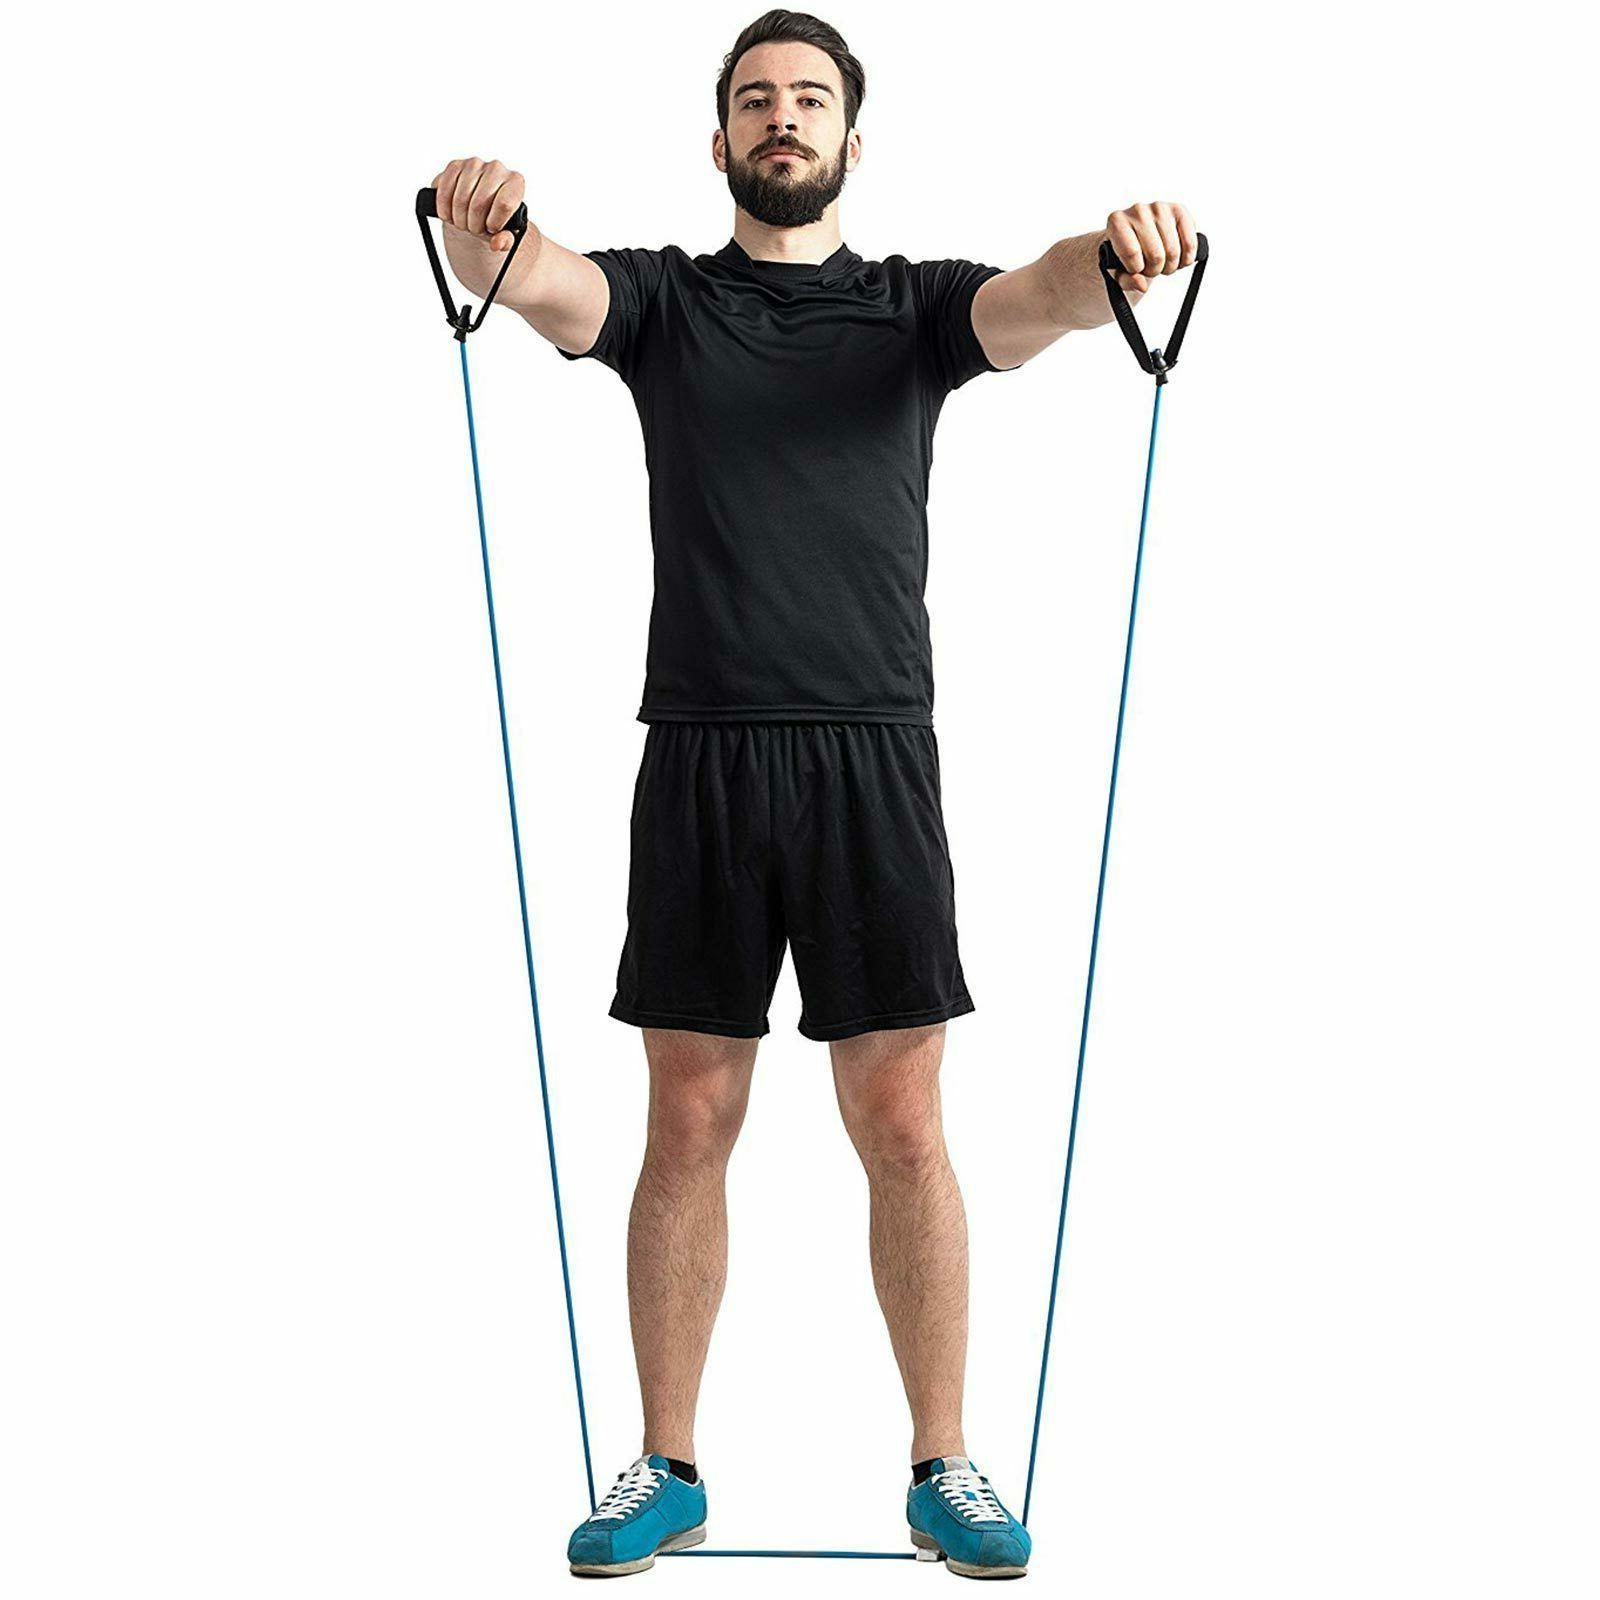 11 Set Pilates Exercise Bands